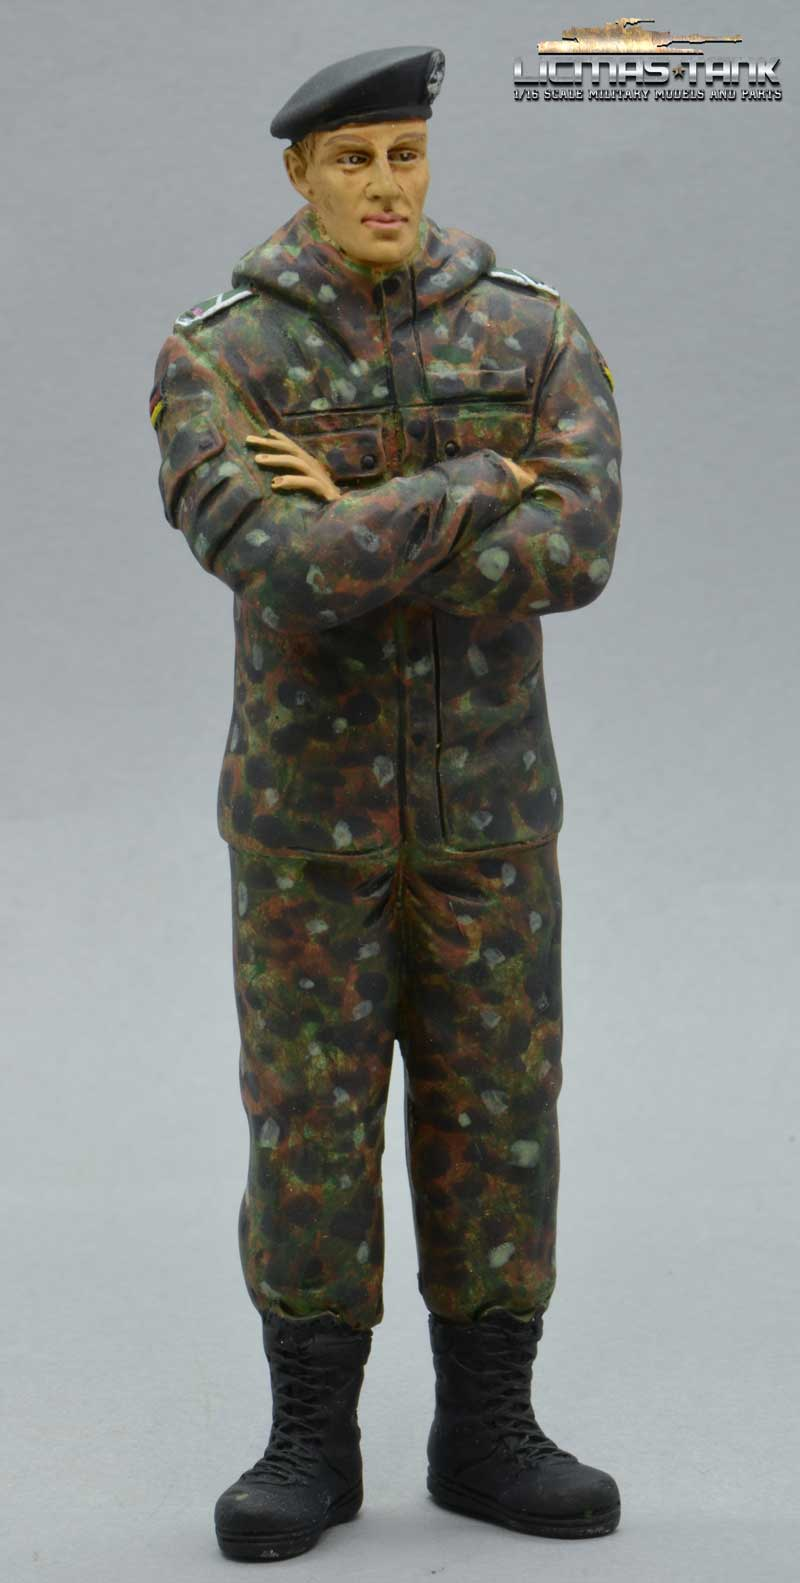 Figur Bundeswehr Soldat Panzertruppe Maßstab 1:16 Flecktarn